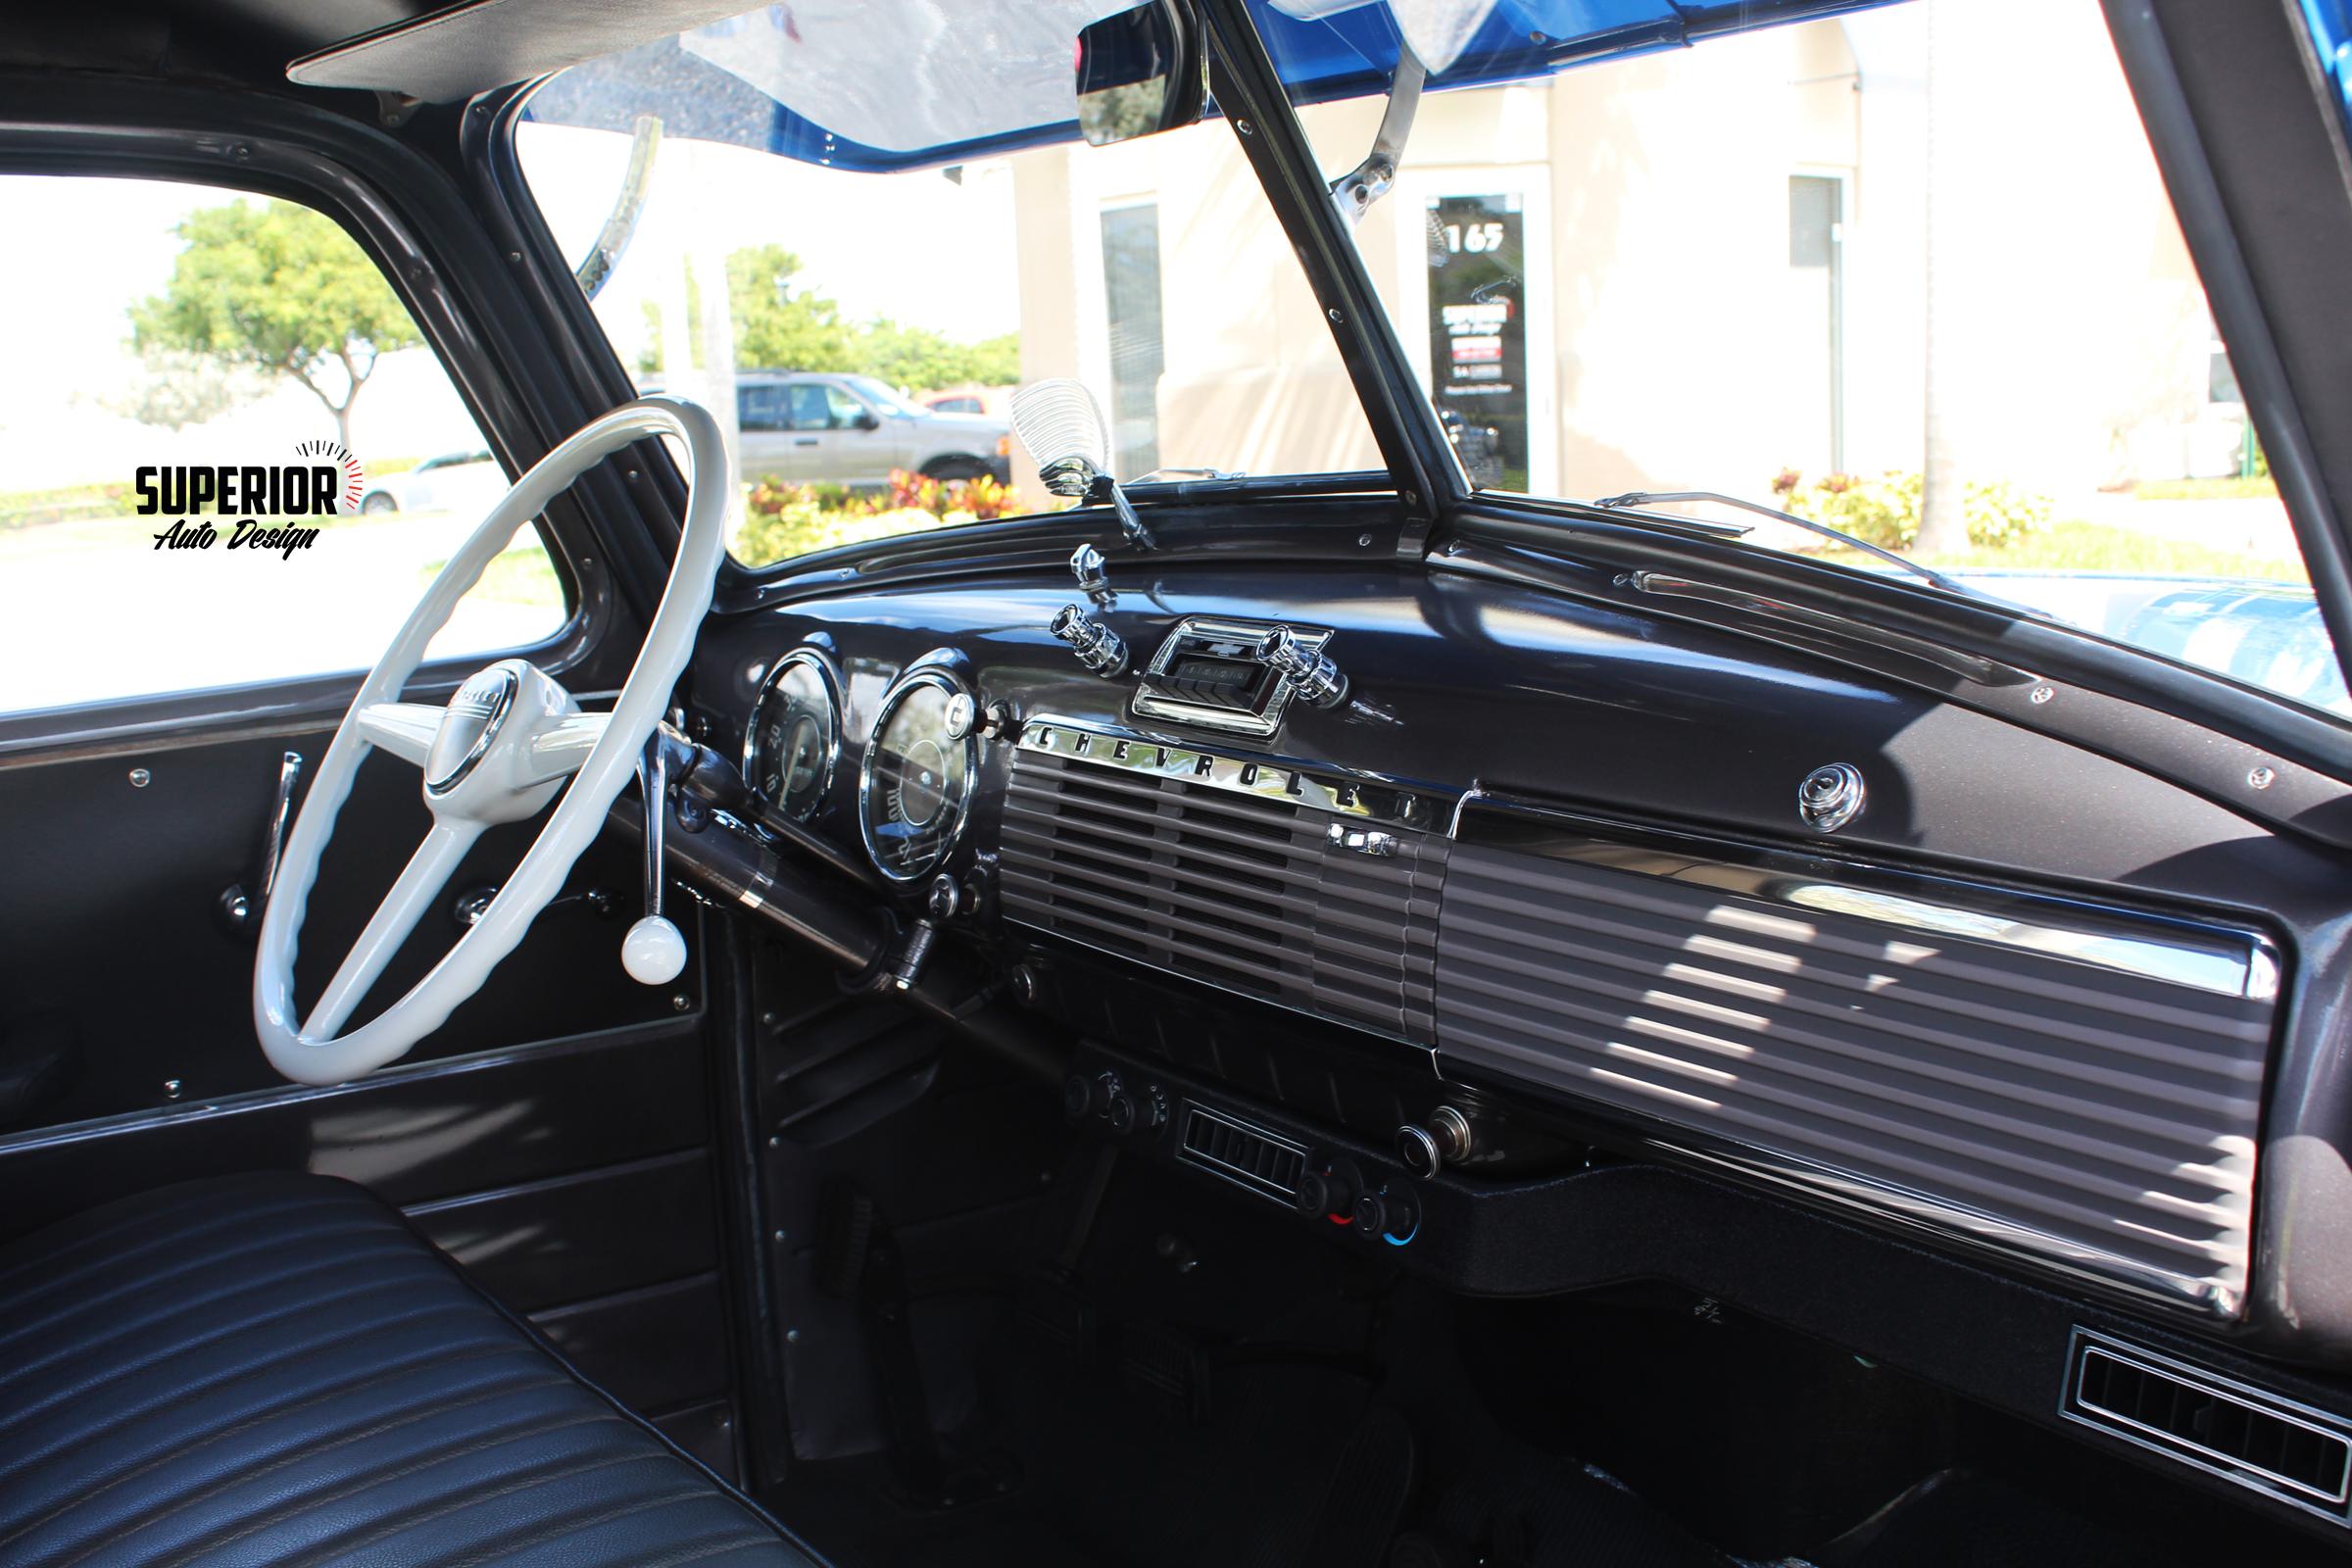 1950-chevy-pickup-superior-auto-design-5